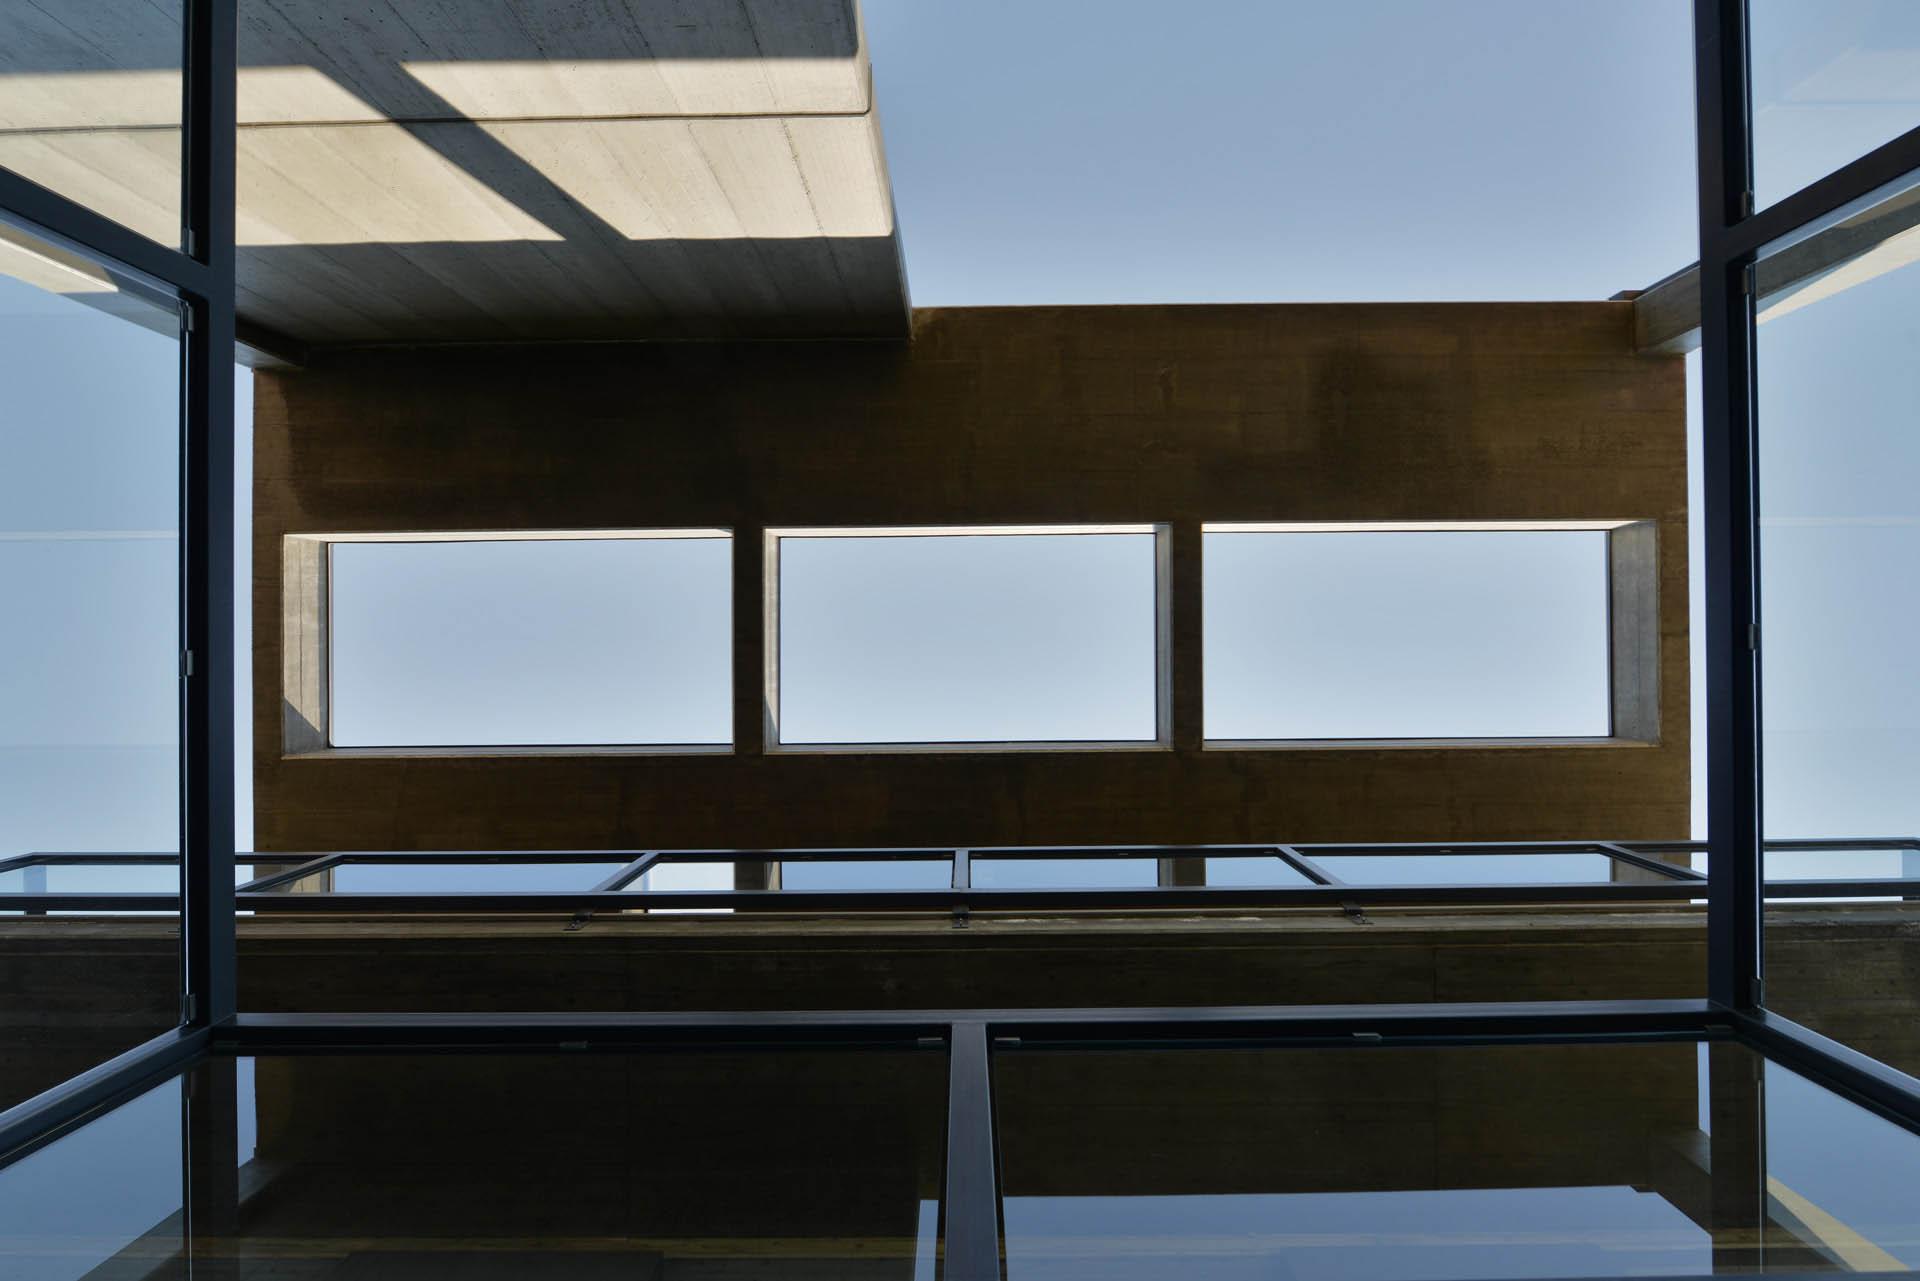 08 Studio Bacchi architetti associati casa 3 img 08